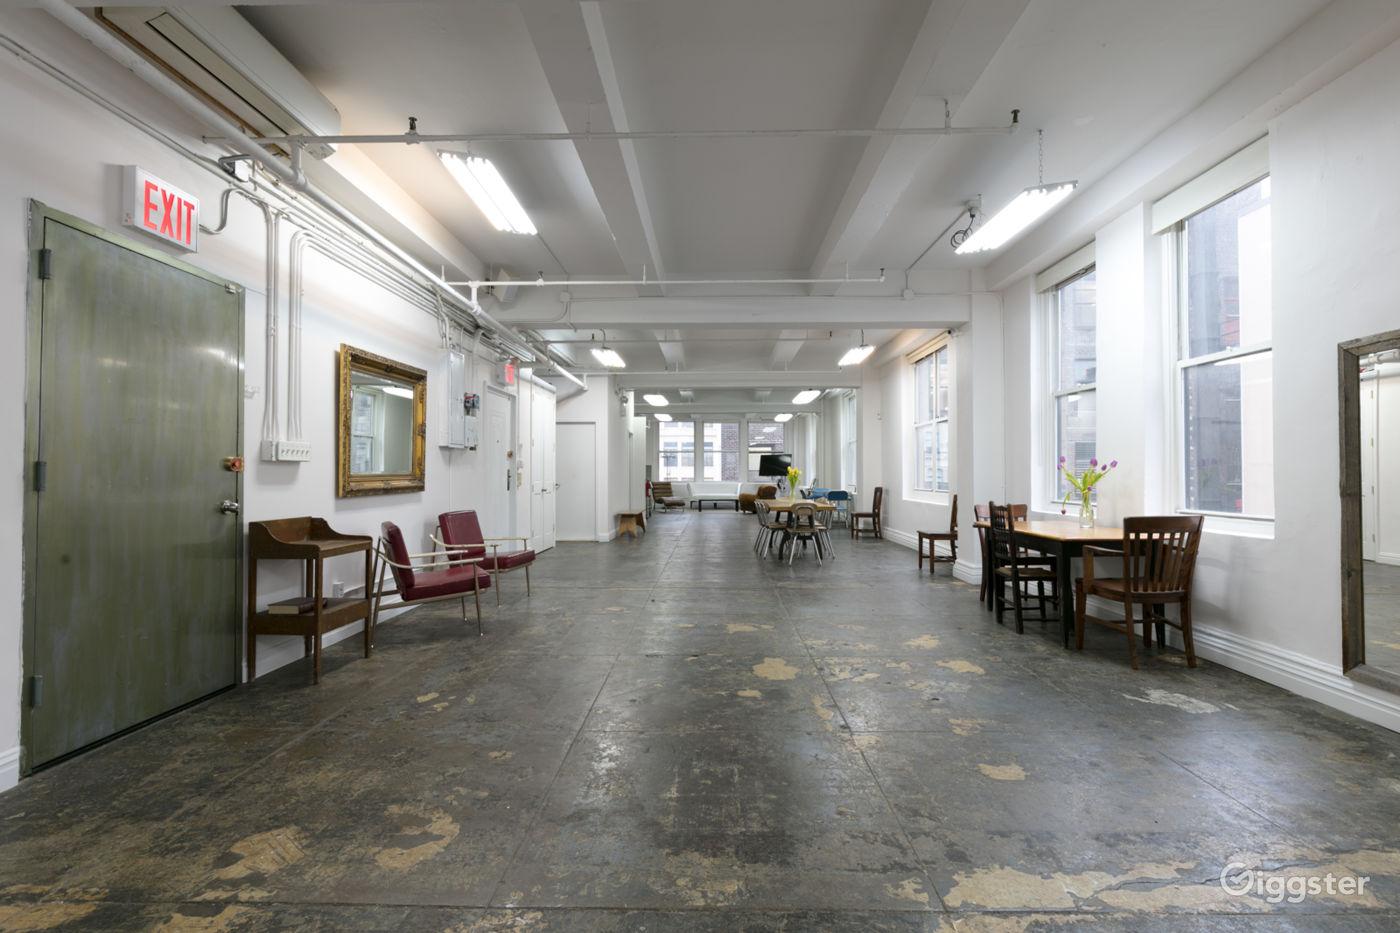 Manhattan 2000 sq ft Studio Loft Rent this location on